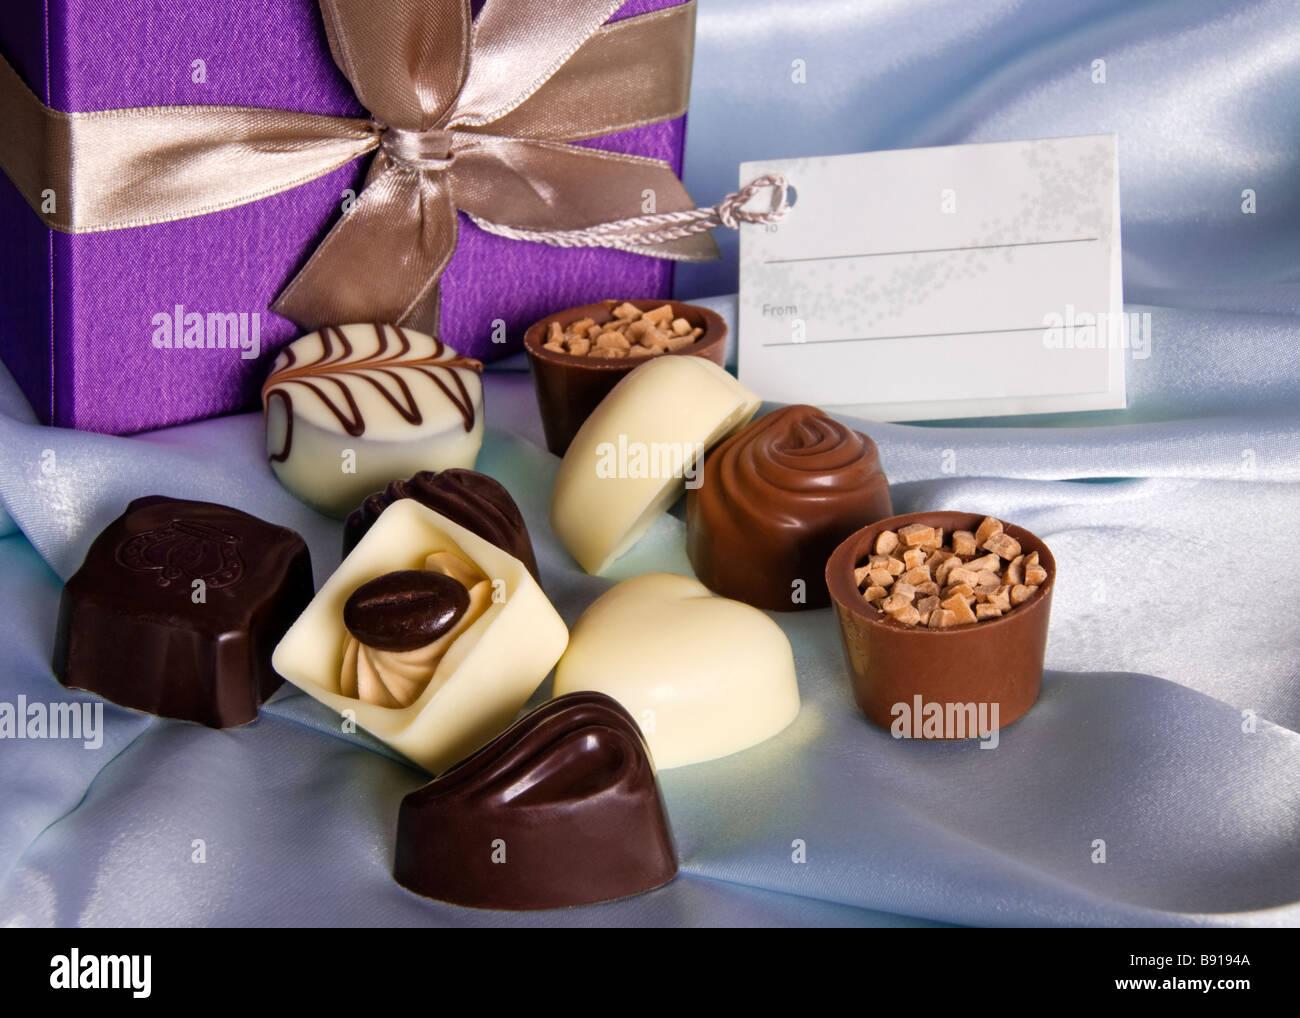 Caja de regalo de surtido de chocolates belgas. Imagen De Stock